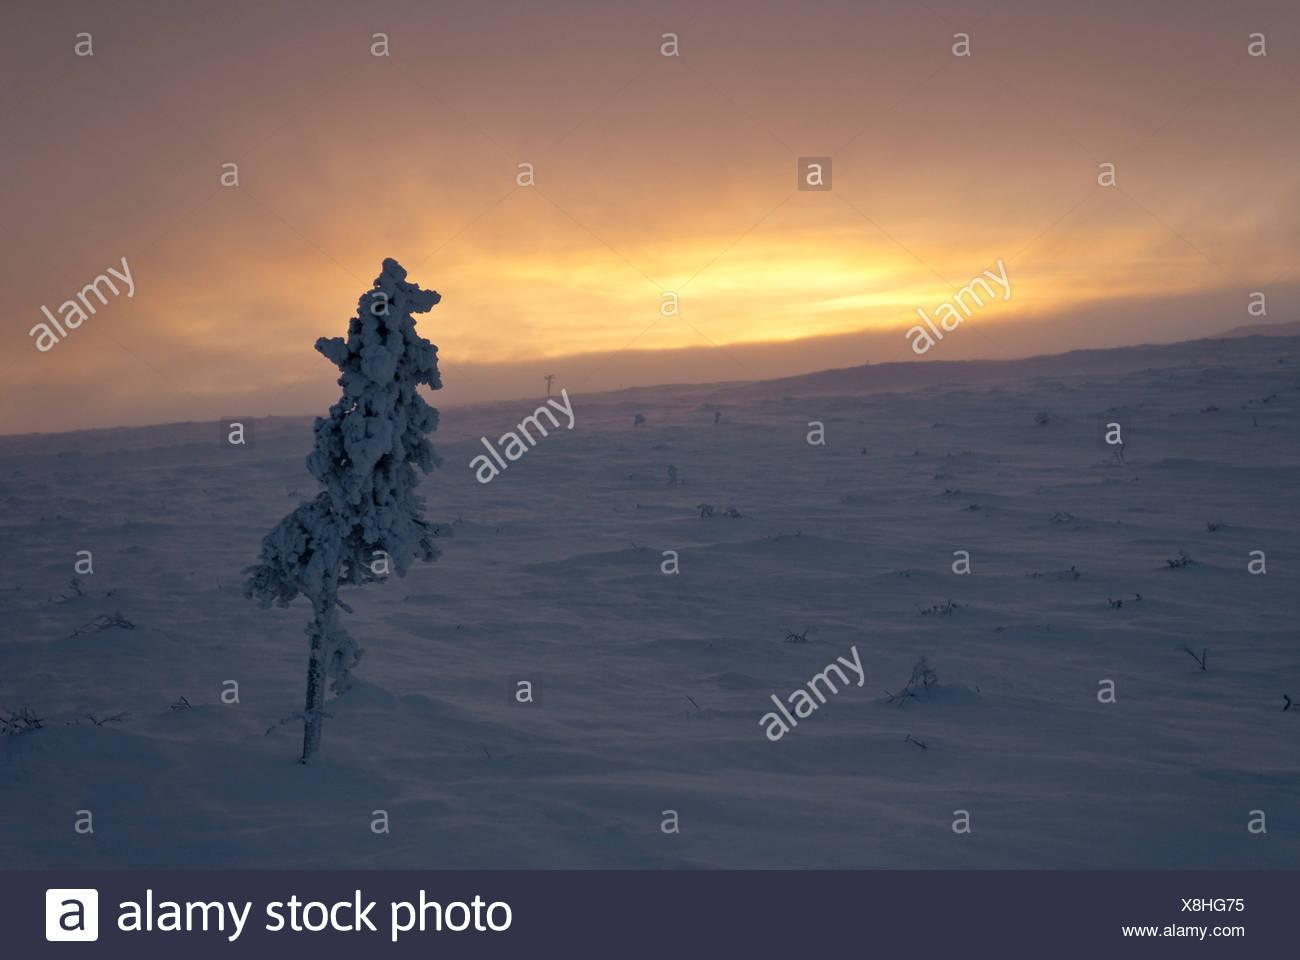 Arktis, Einsamkeit, Europa, Finnland, Fjell, Fjall, Kiilopaa, kalt, Lappland, Licht, Melancholie, Morgen, Morgendämmerung, Morgengrauen, Roter Himmel, Stockbild